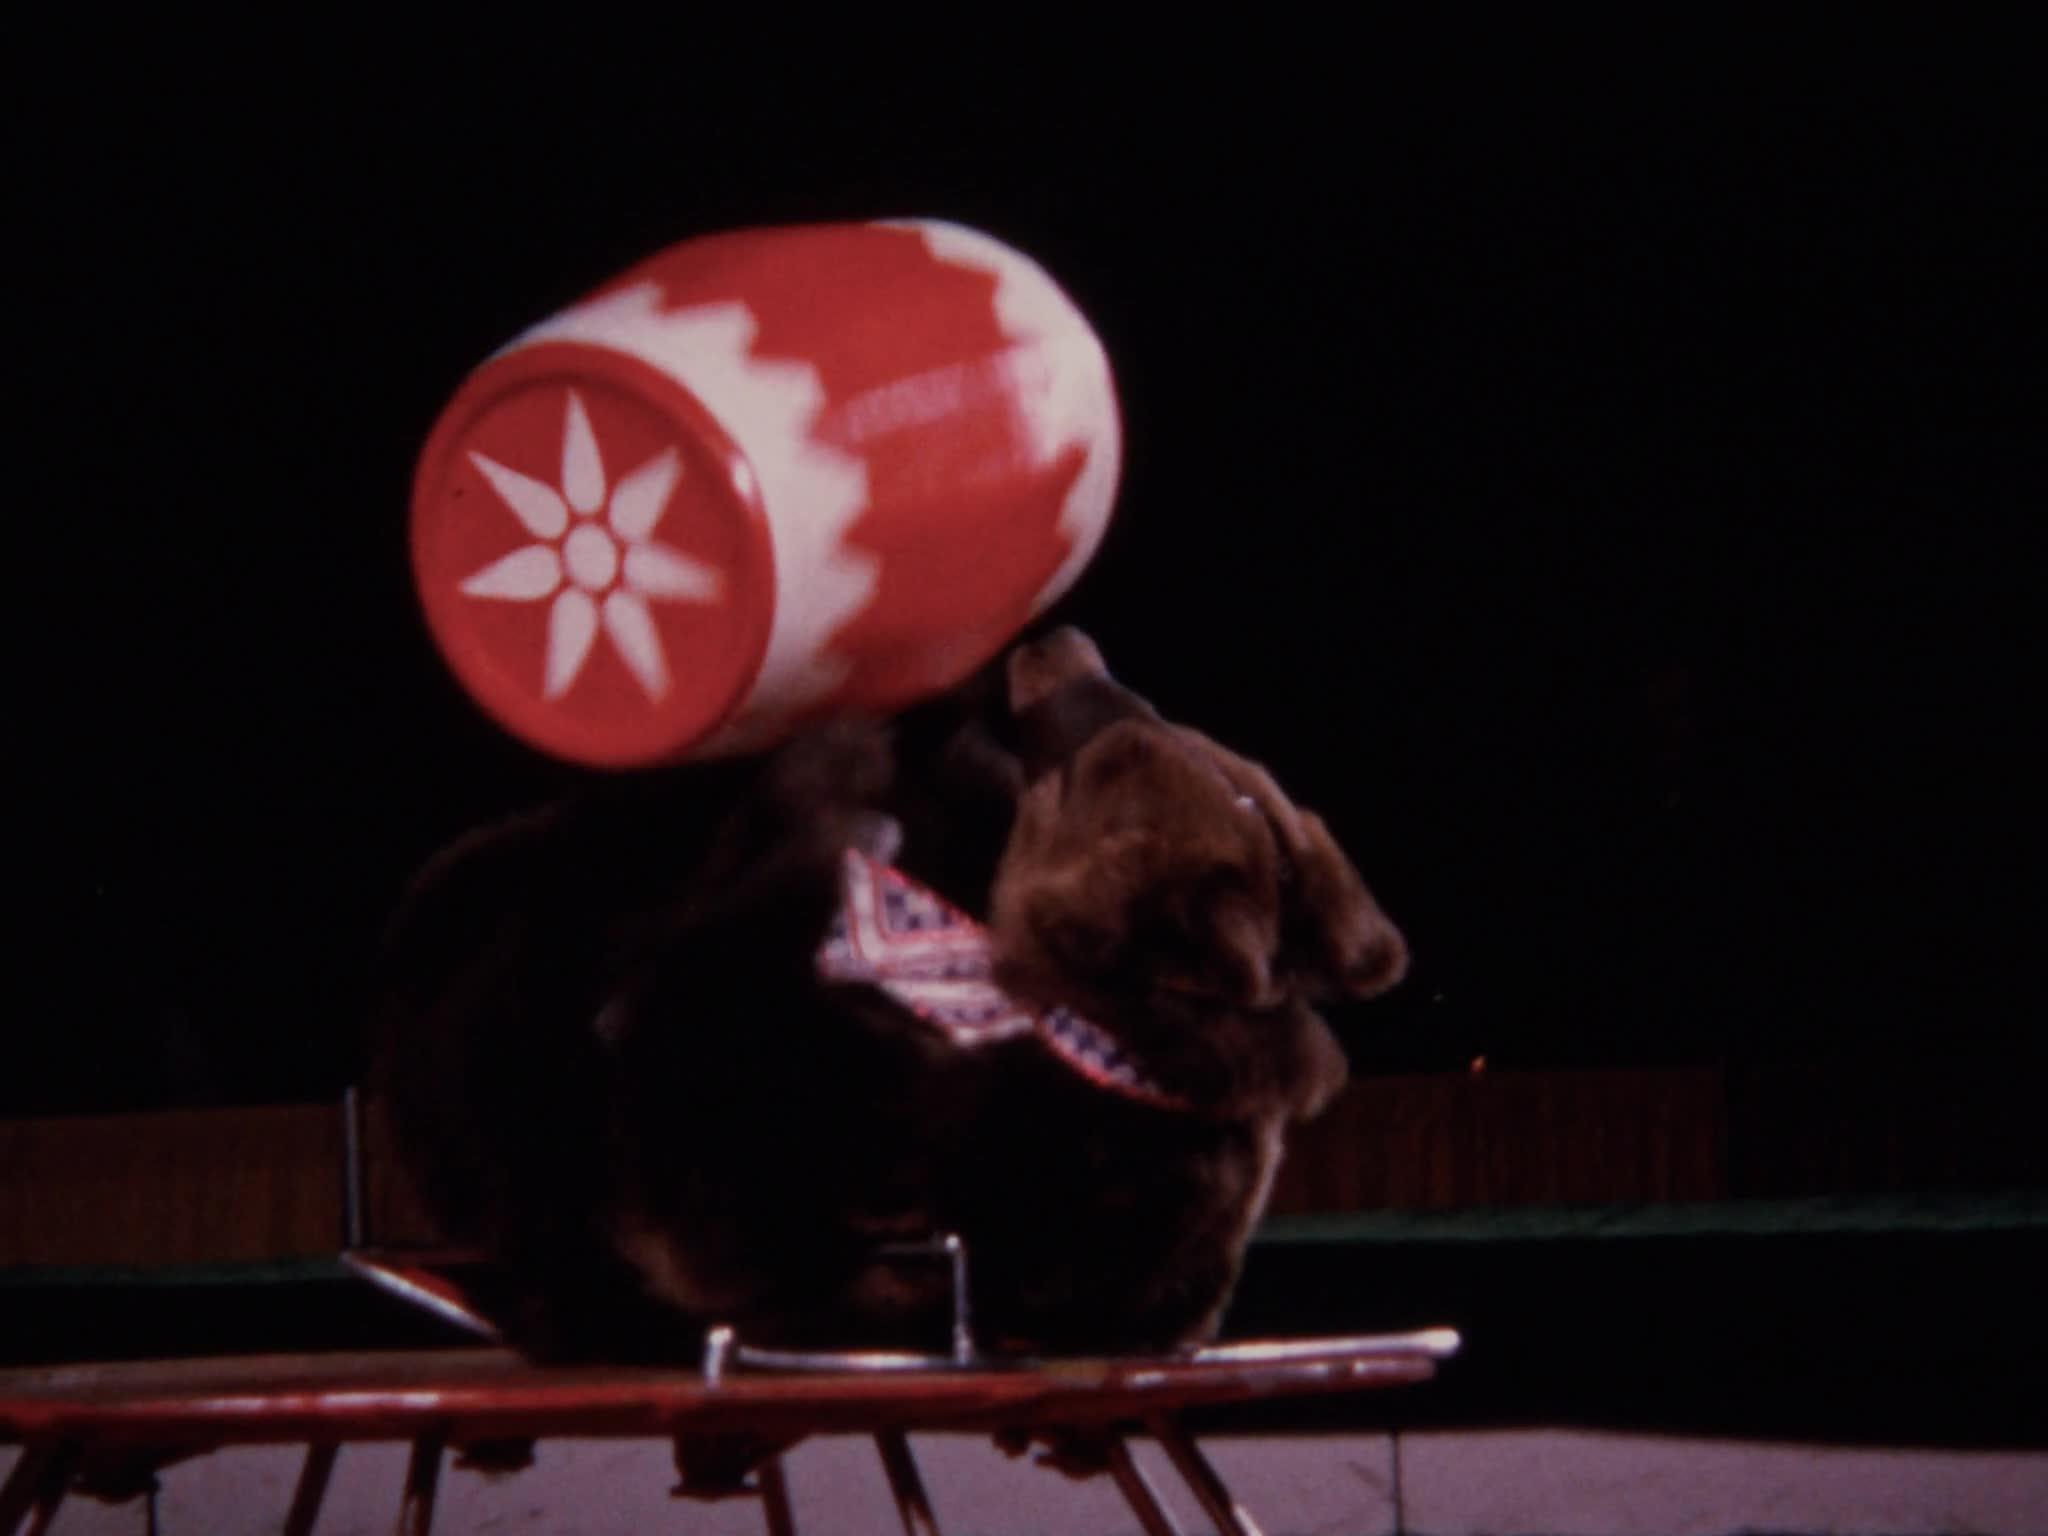 Popov the Russian Clown, Hand Balancing Act, Juggler